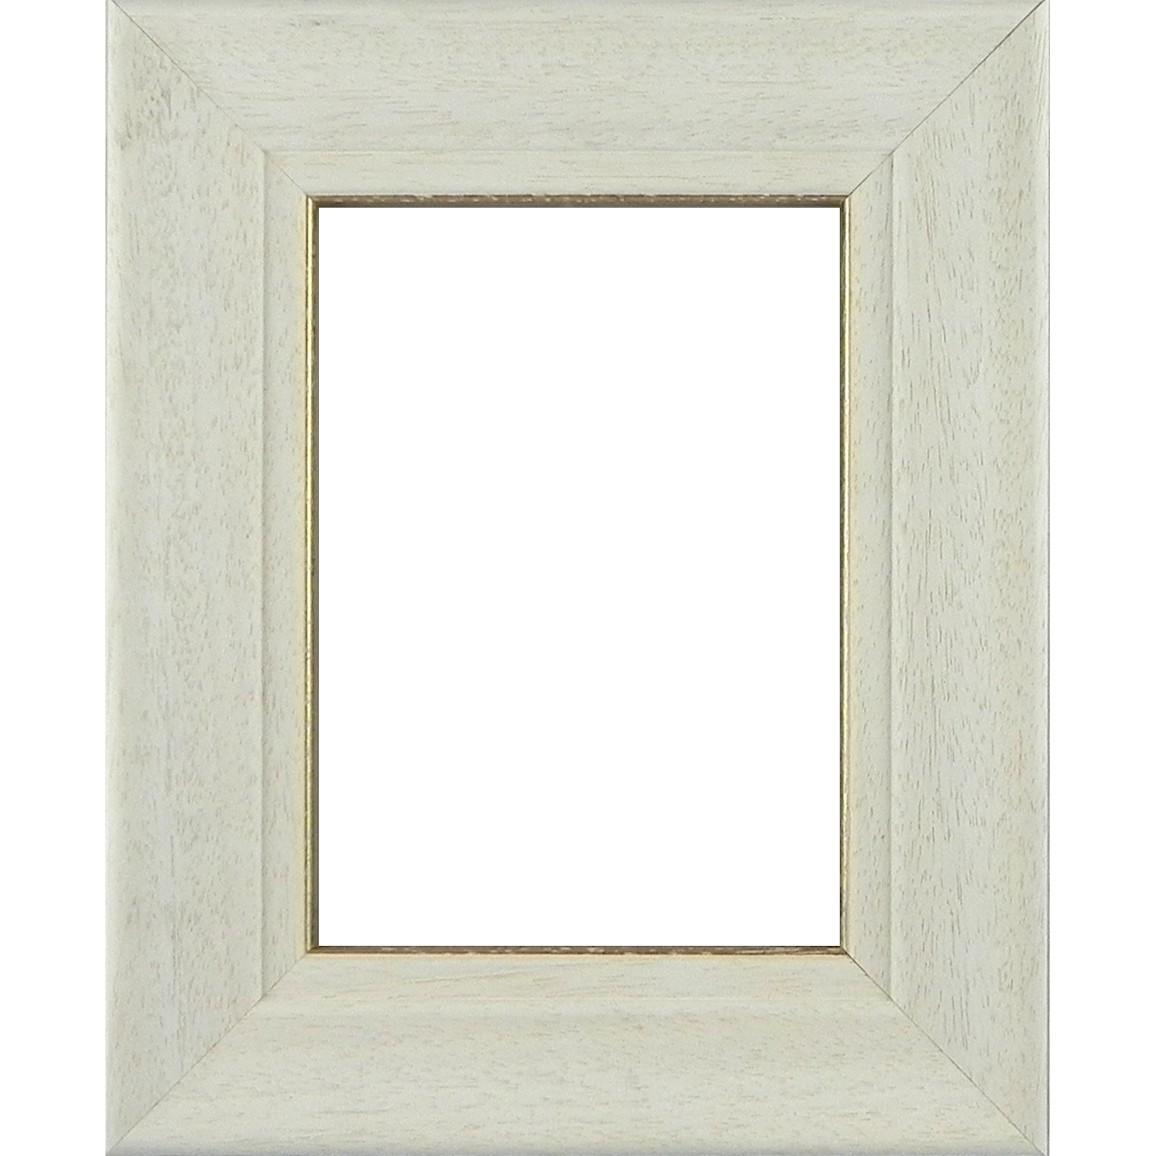 Picture Frame White Lime Frame Gold line